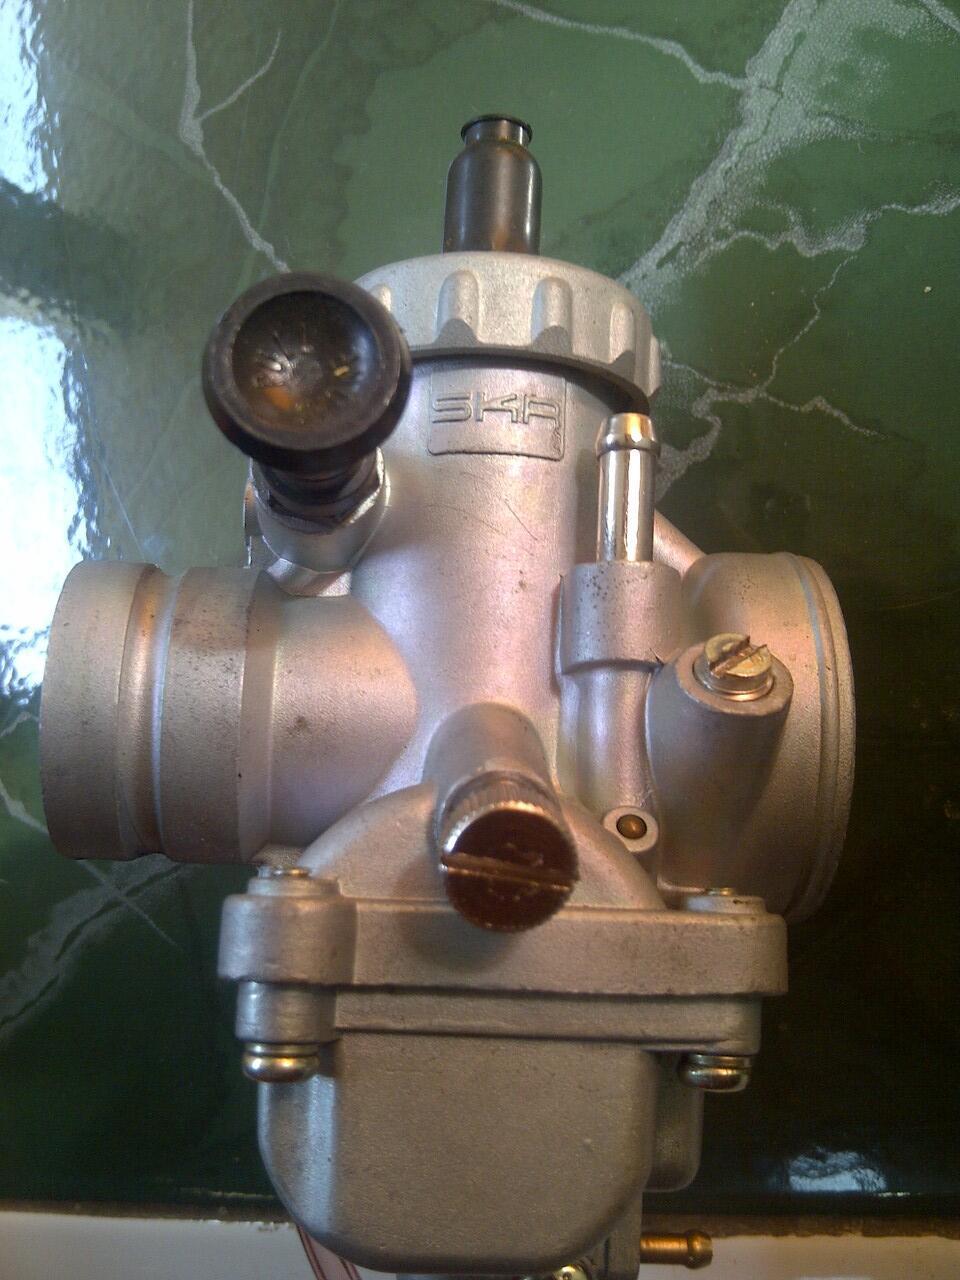 Karburator RX king merk SKR (dulu namanya lippo)